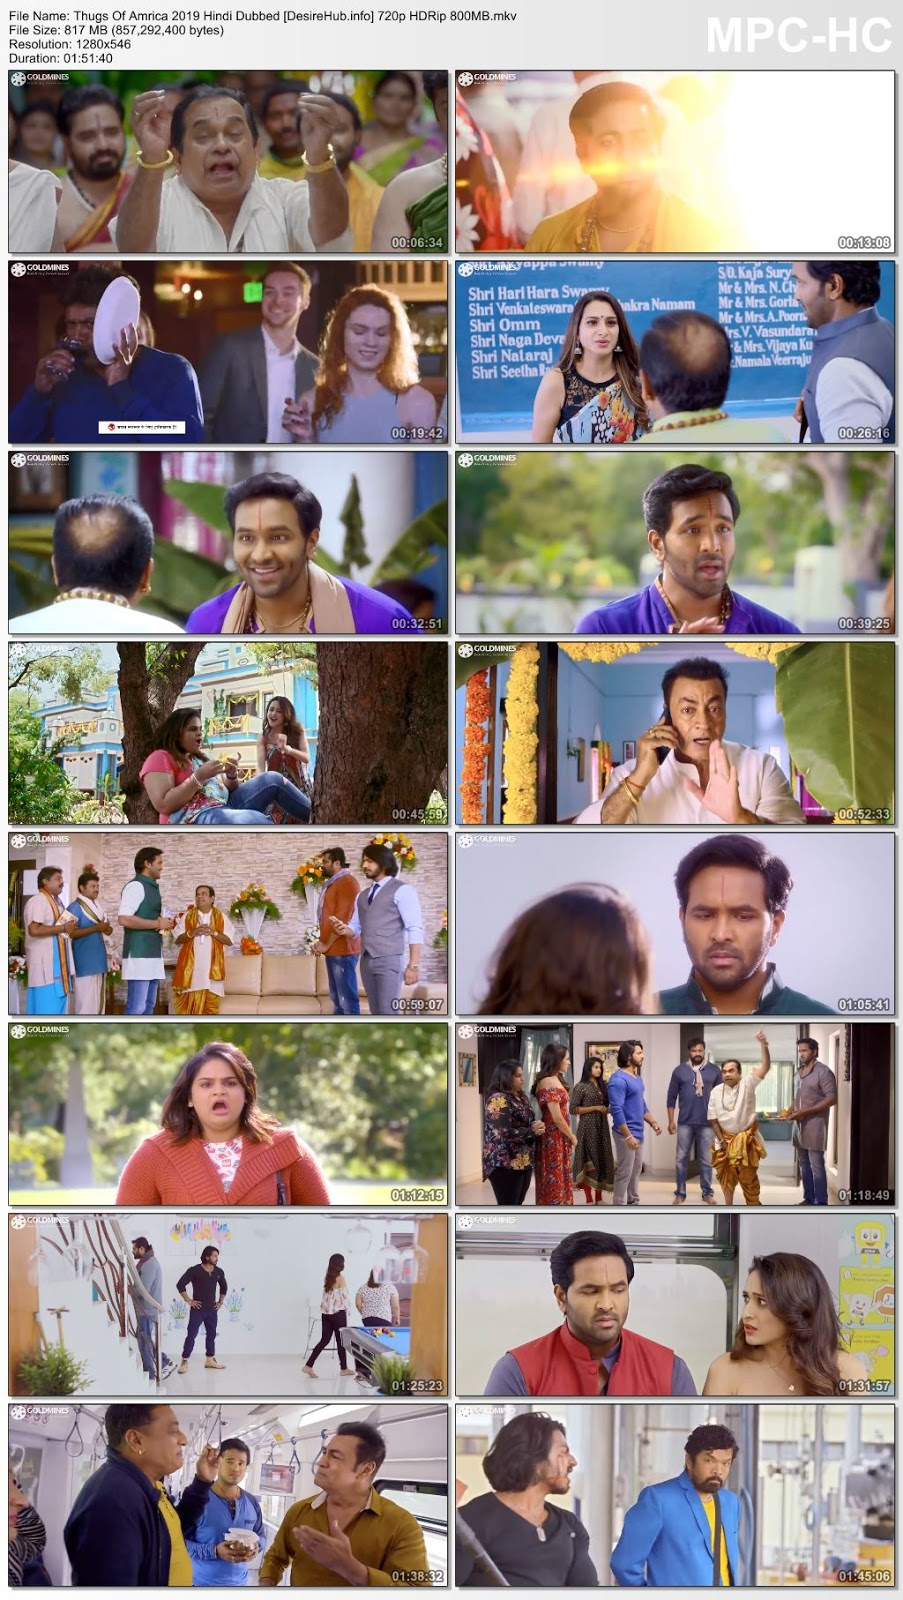 Thugs Of Amrica 2019 Hindi Dubbed 720p HDRip 800MB Desirehub